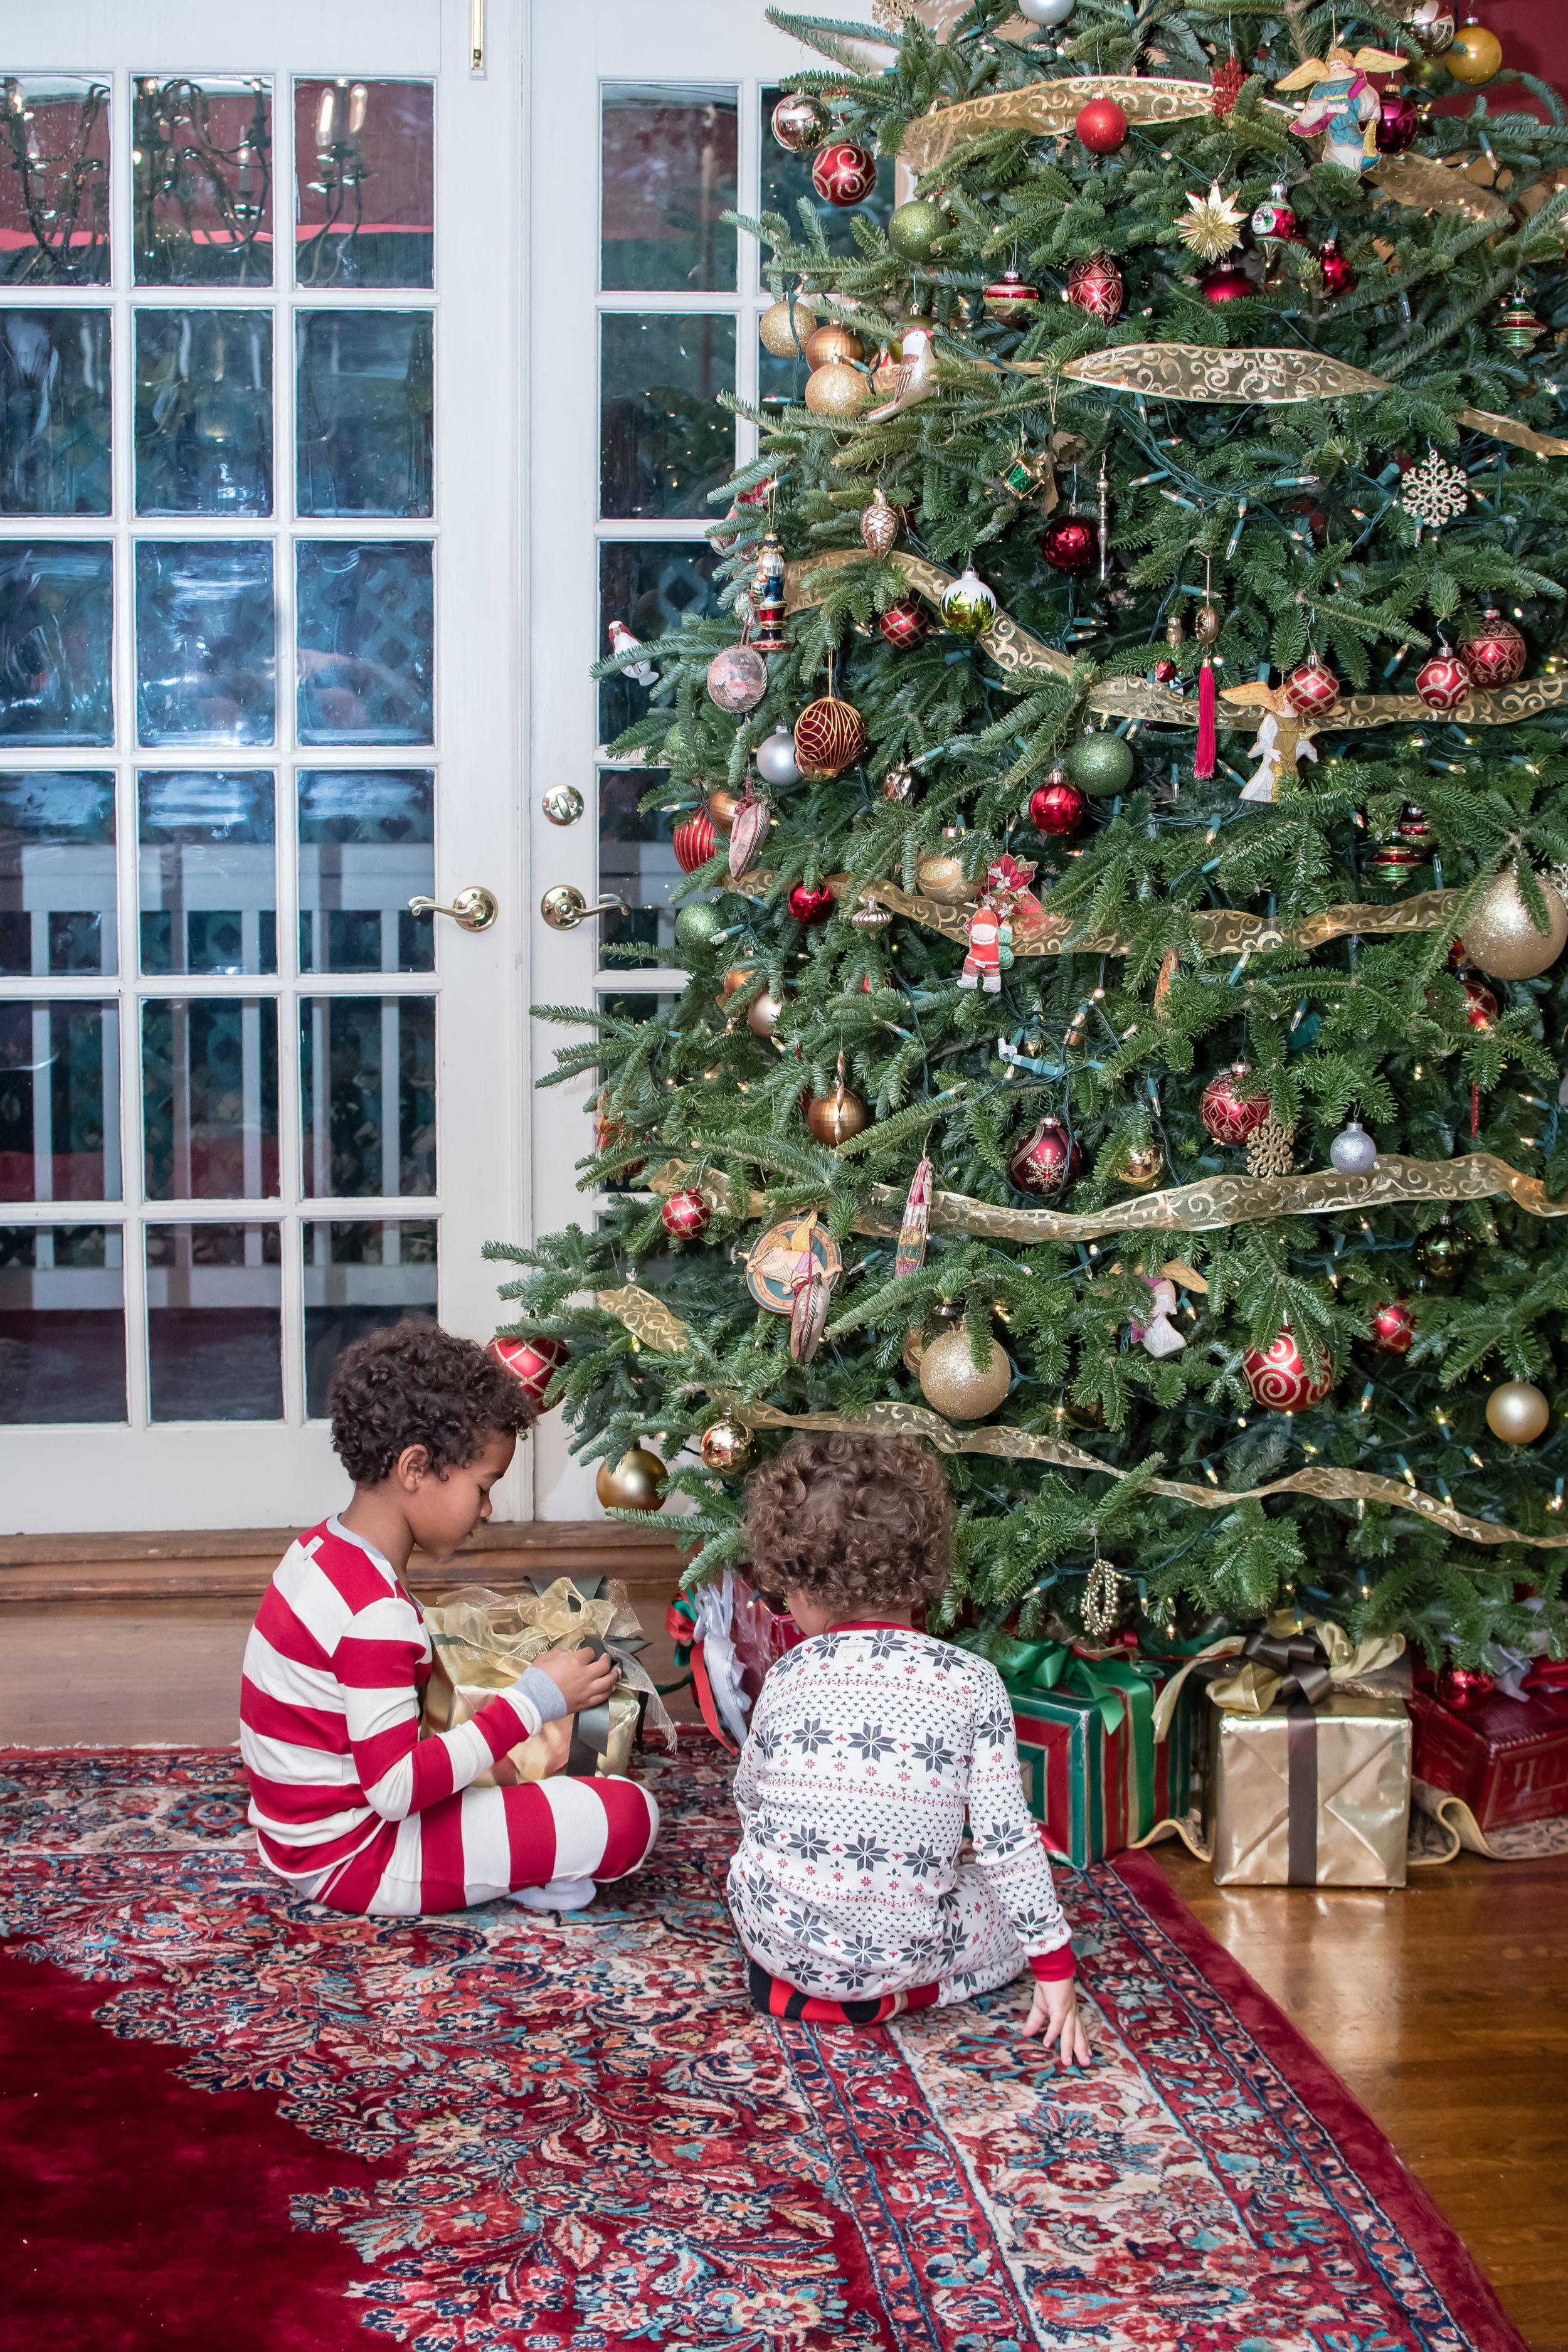 kids opening presents by the Christmas tree on Christmas Day Orlando Photographer Yanitza Ninett